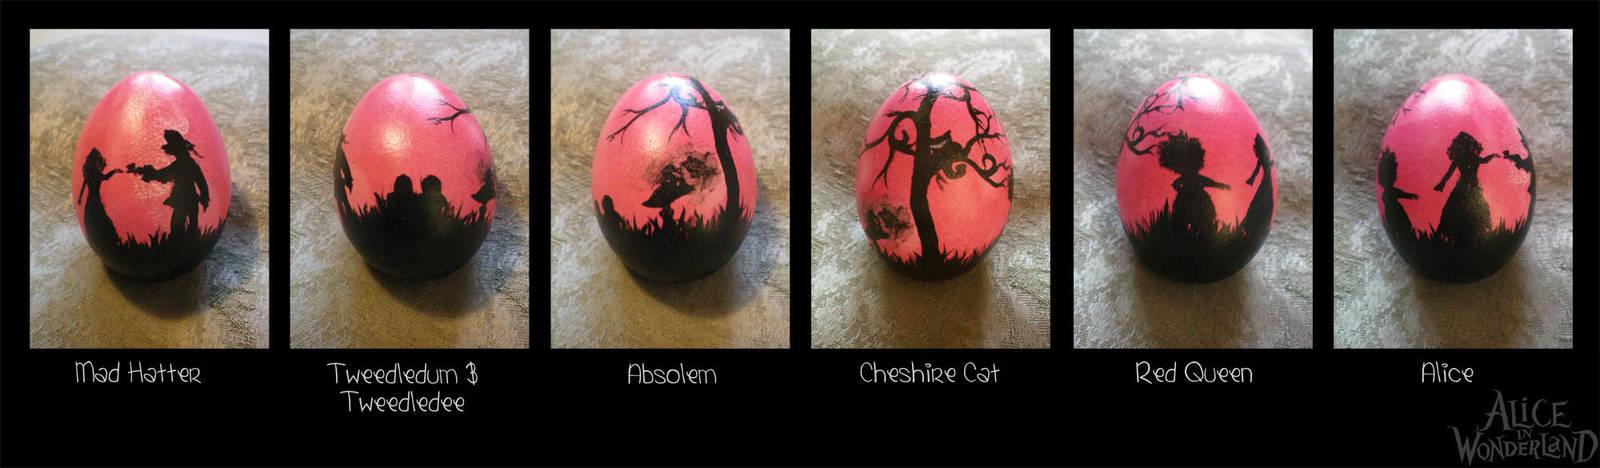 Easter Egg Alice in Wonderland by Ashqtara